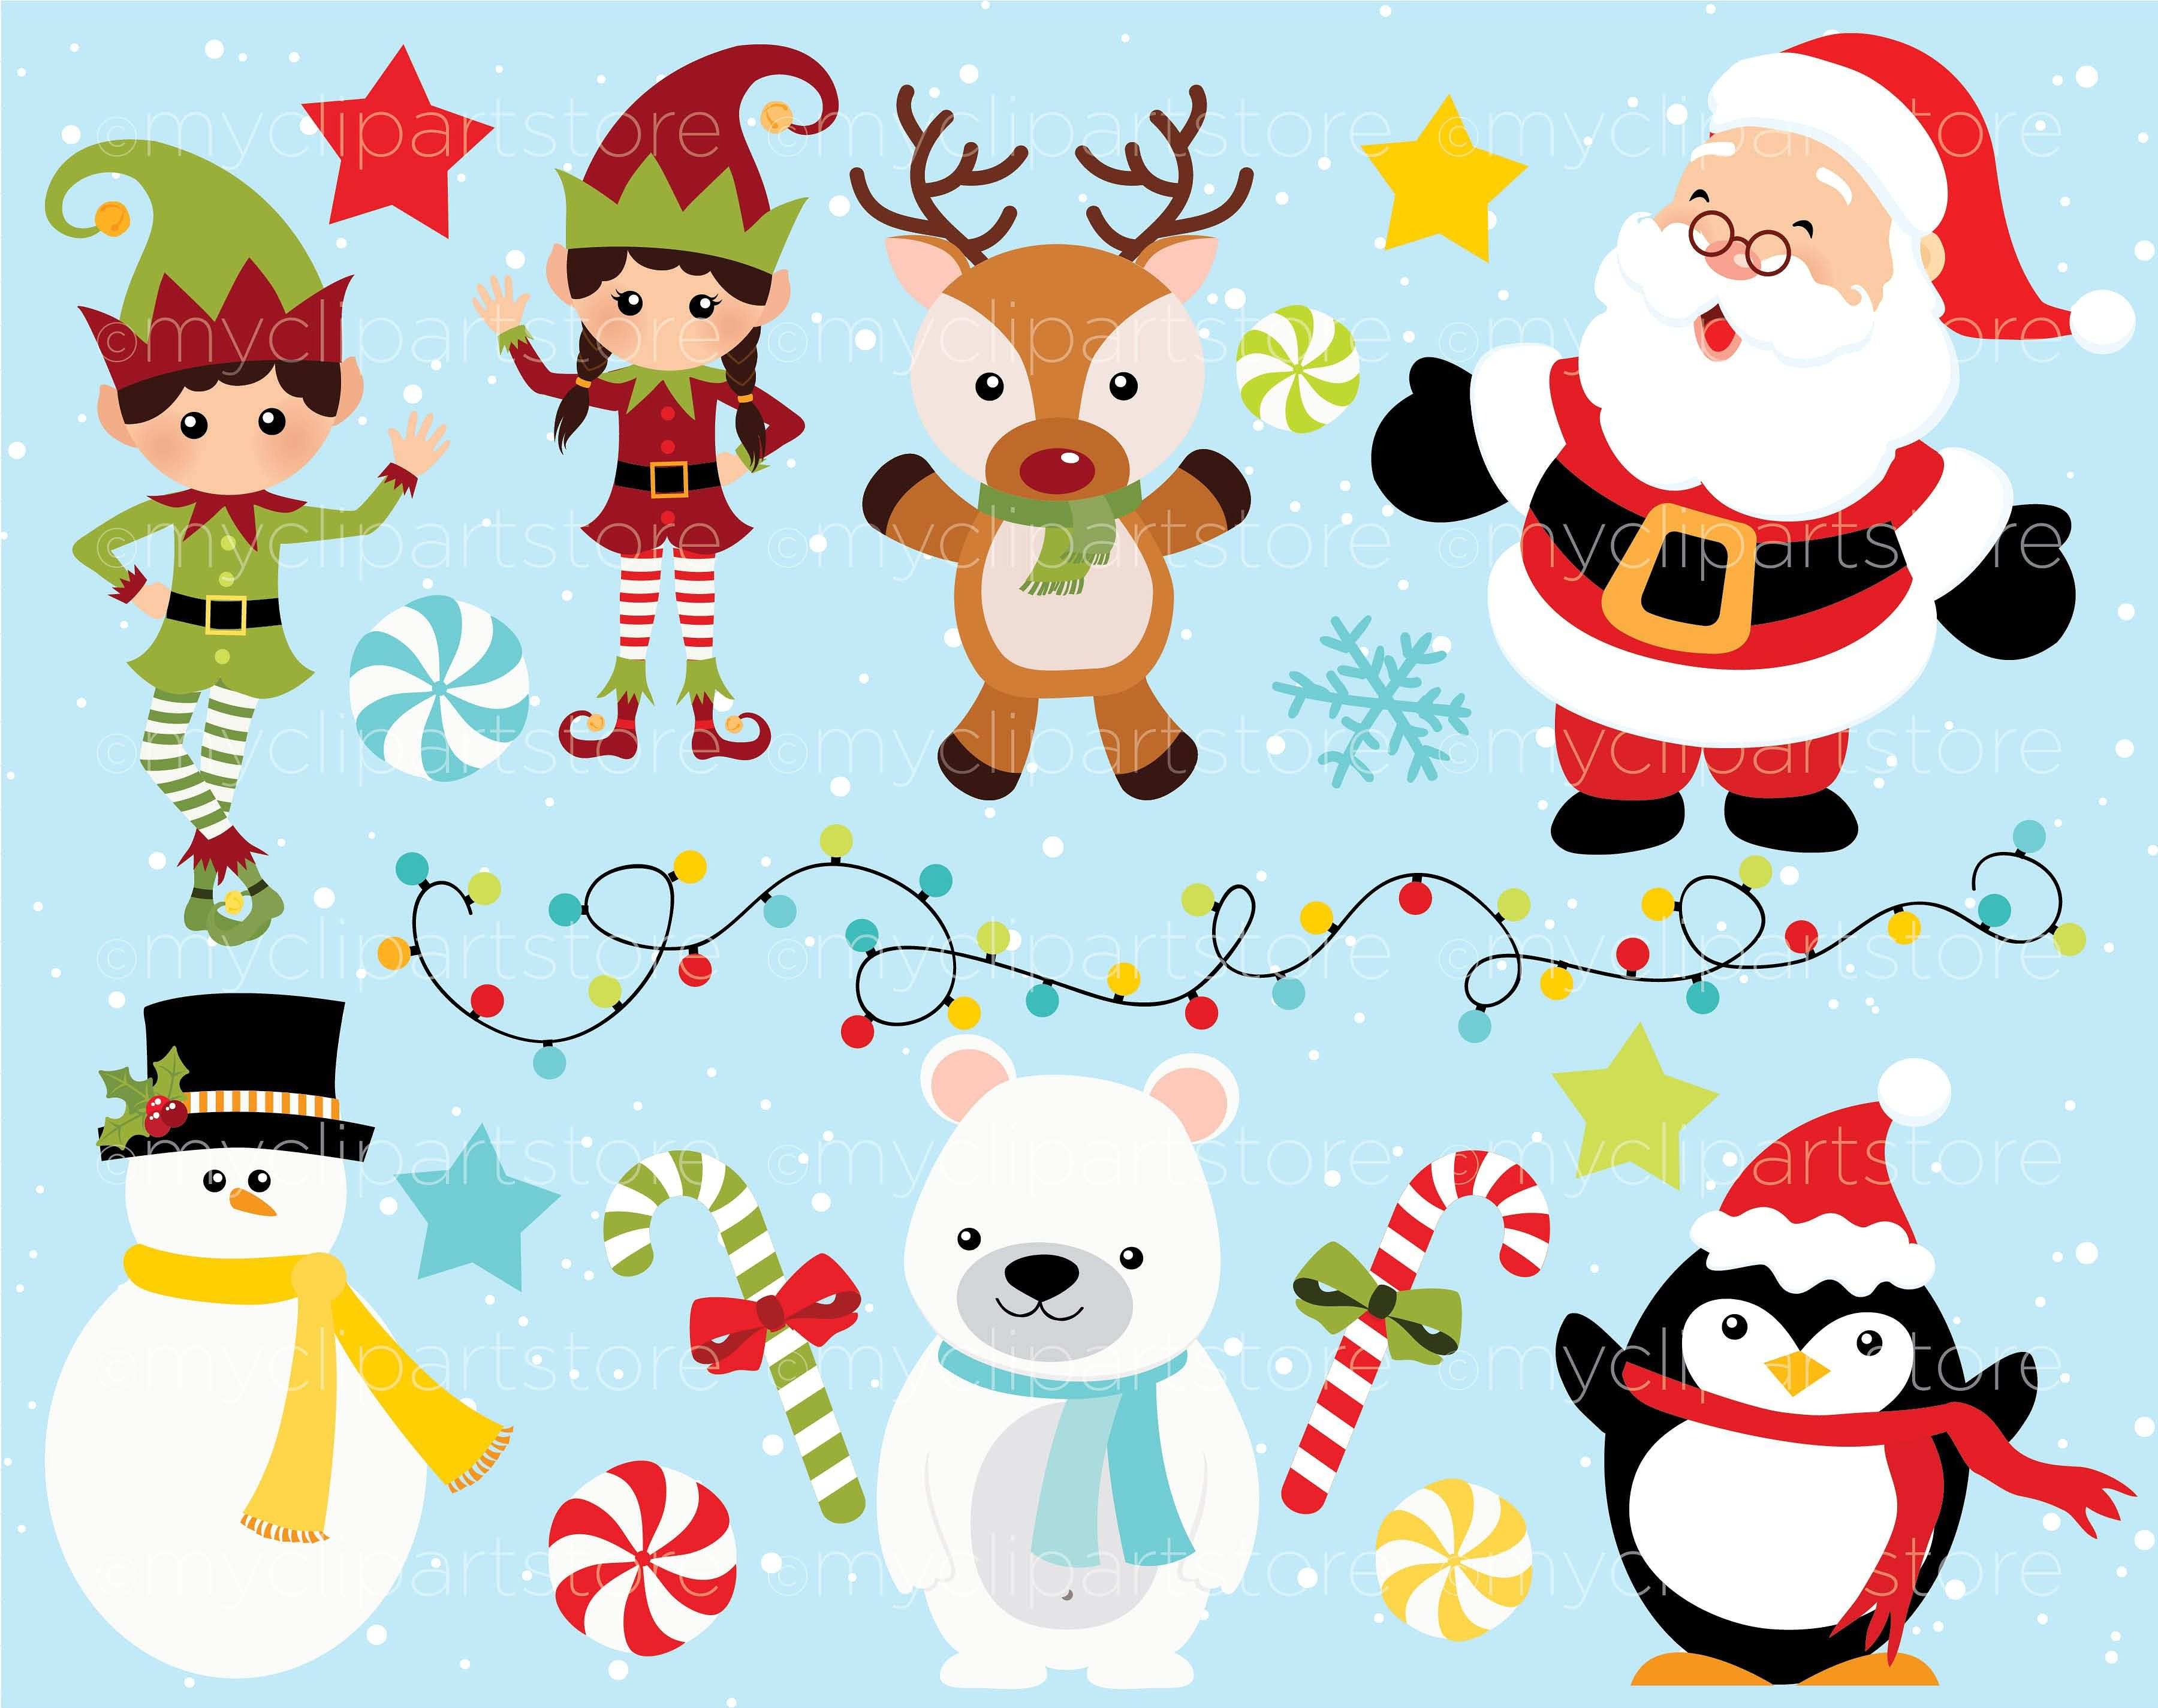 Chrisstmas and hannukah clipart clipart transparent Christmas, Santa\'s Helpers Clipart #CLIPART#www#HANUKKAH#CHRISTMAS ... clipart transparent